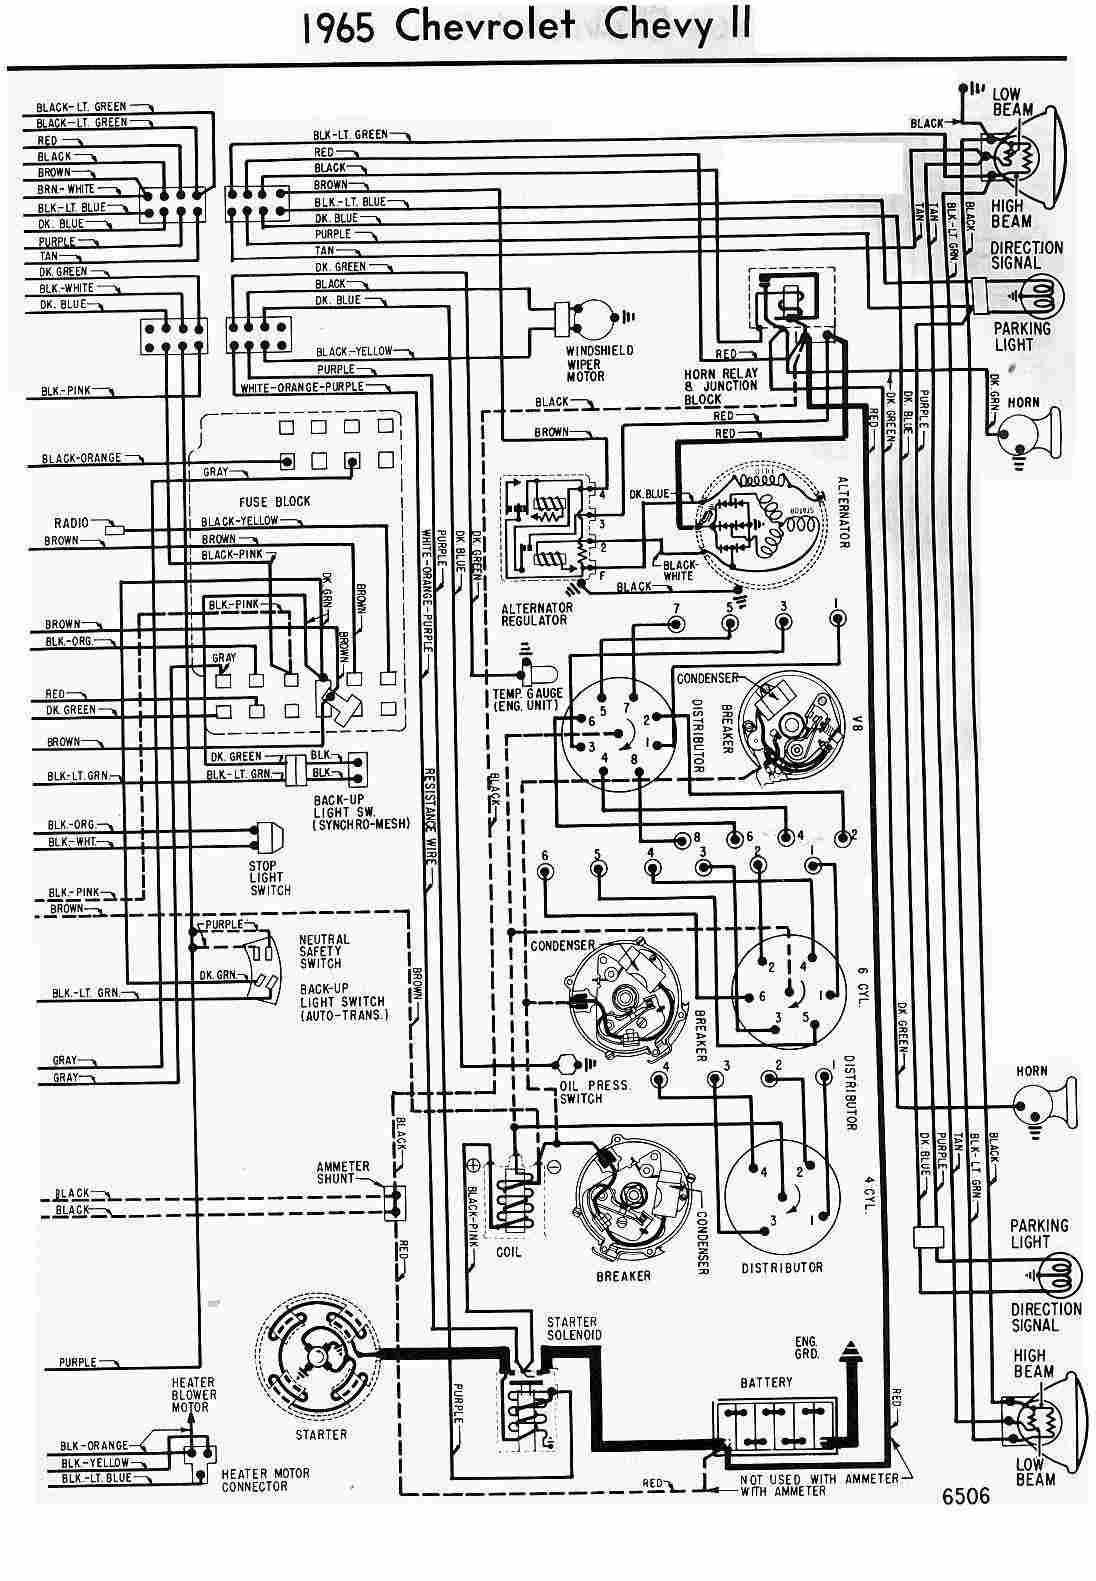 2007 Chevy Aveo Wiring Diagram